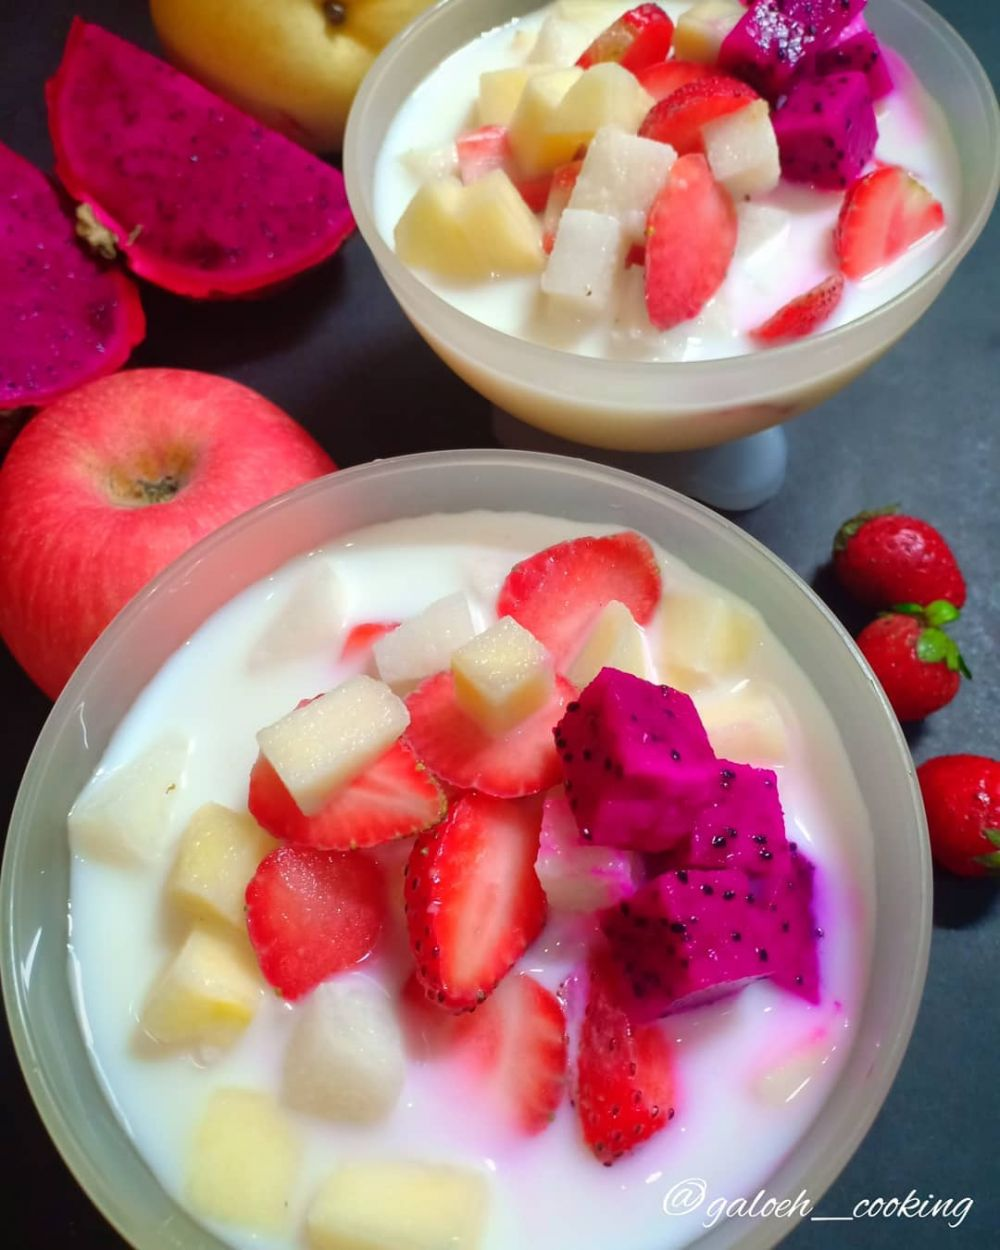 Resep camilan buka puasa berbahan buah © Instagram